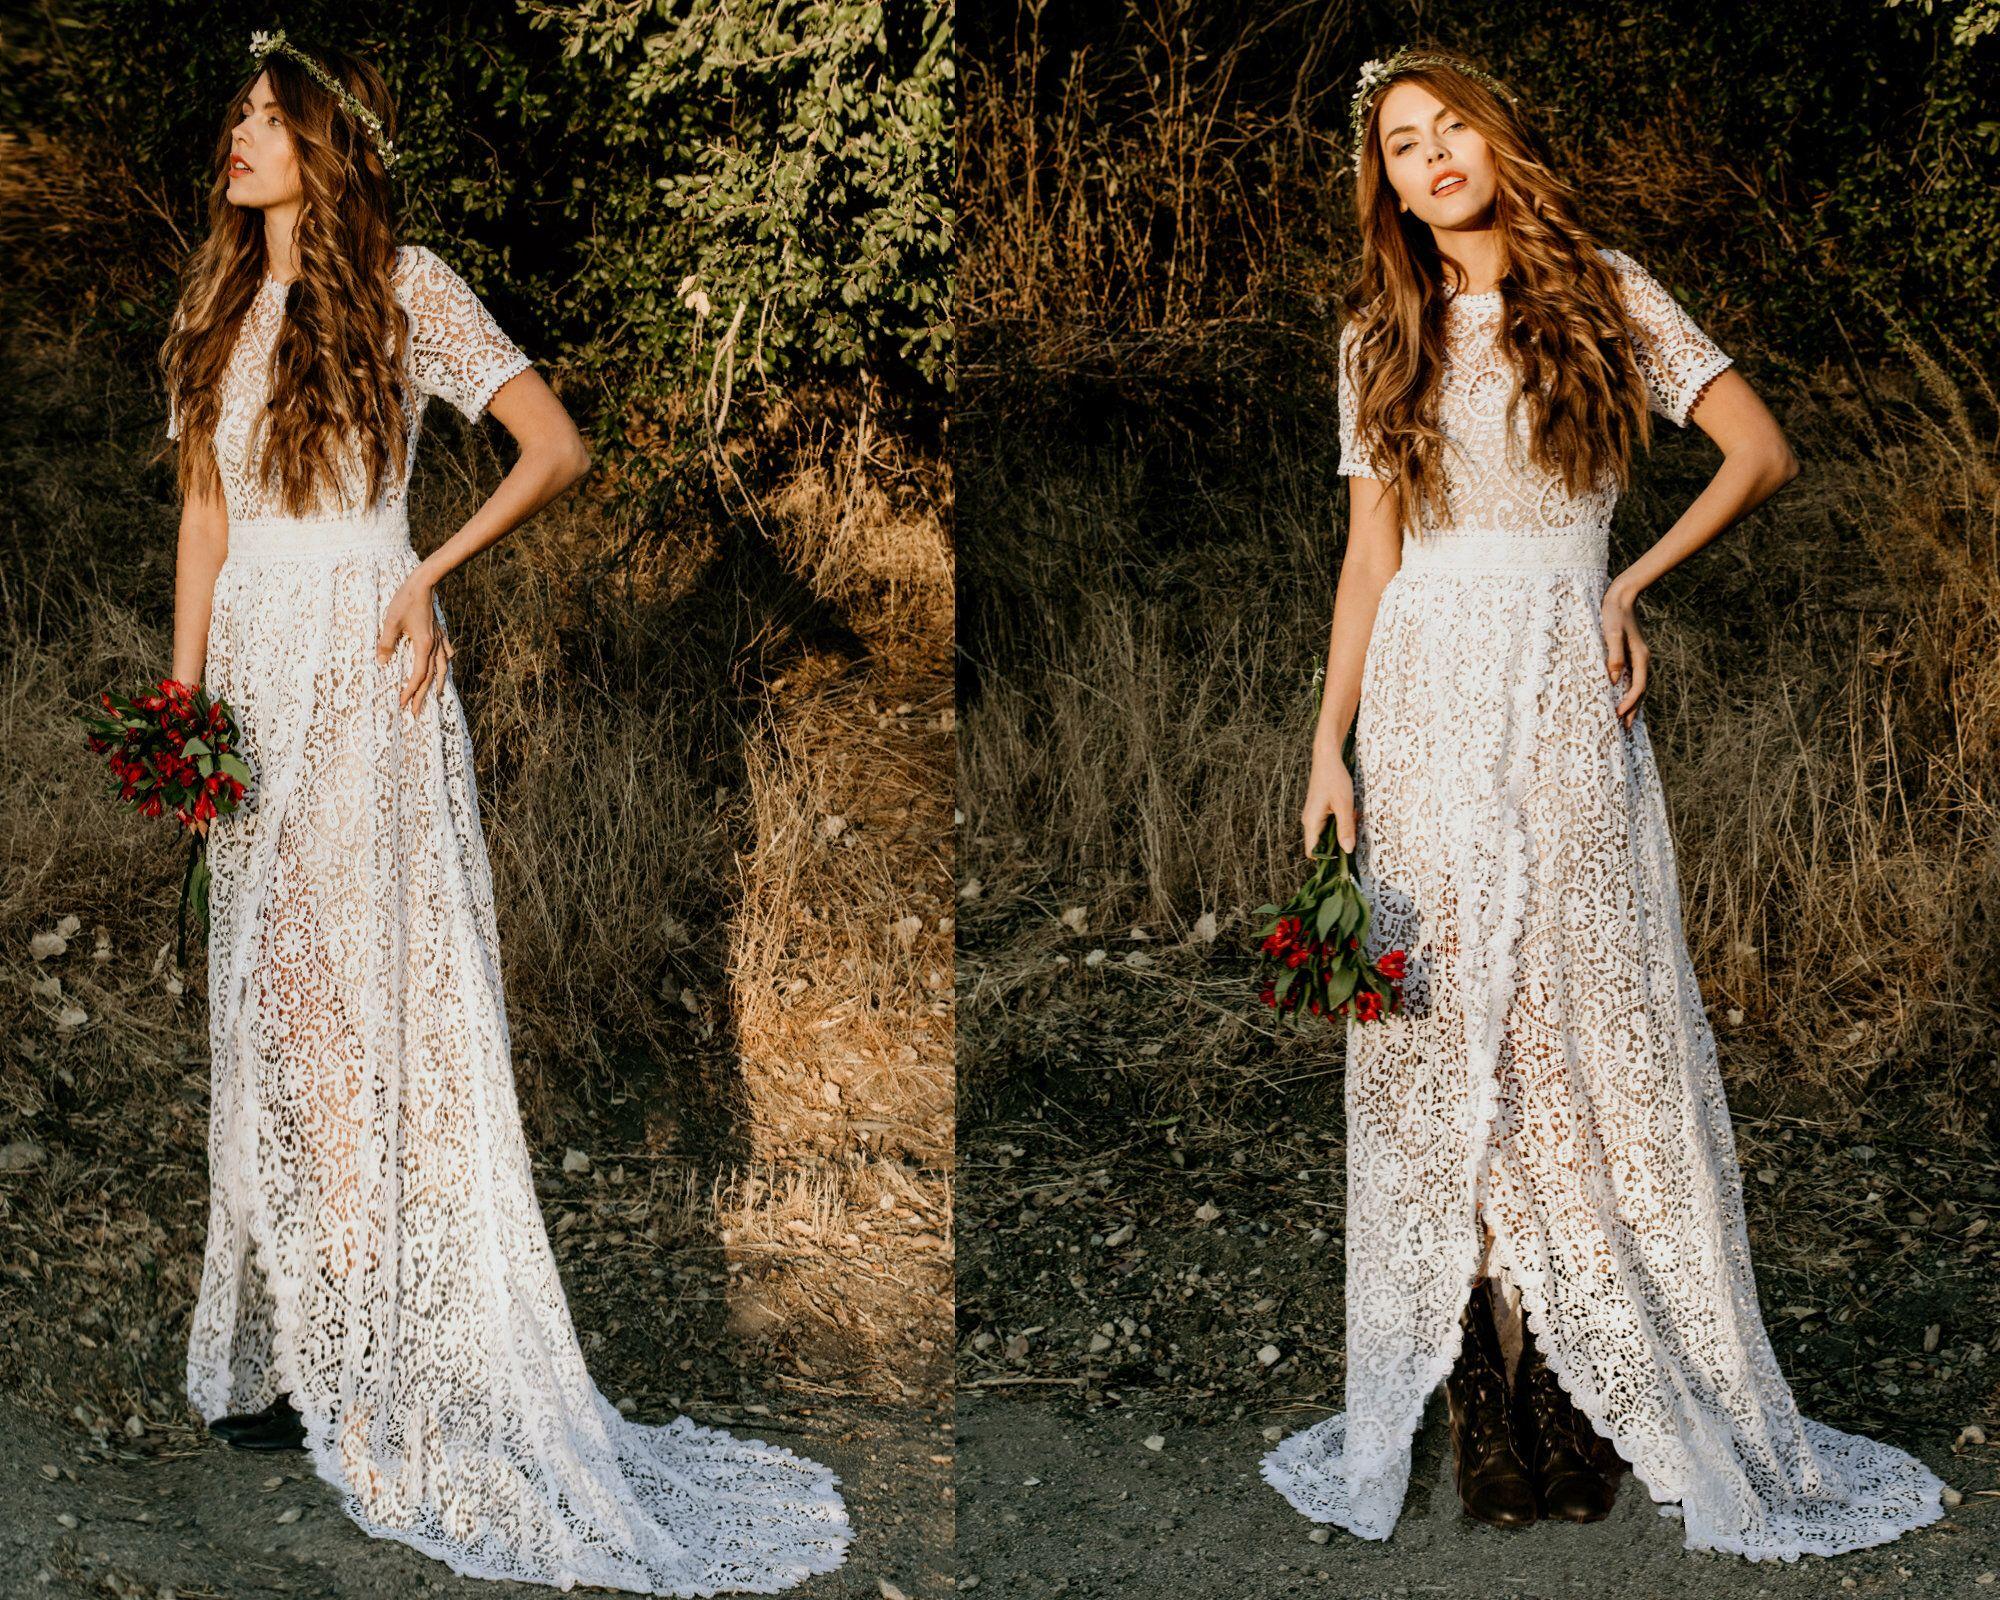 Wedding Dress Boho Wedding Dress Crochet Lace Short Sleeve Etsy Lace Dress Boho Boho Wedding Dress Lace Wedding Dress Vintage [ 1600 x 2000 Pixel ]